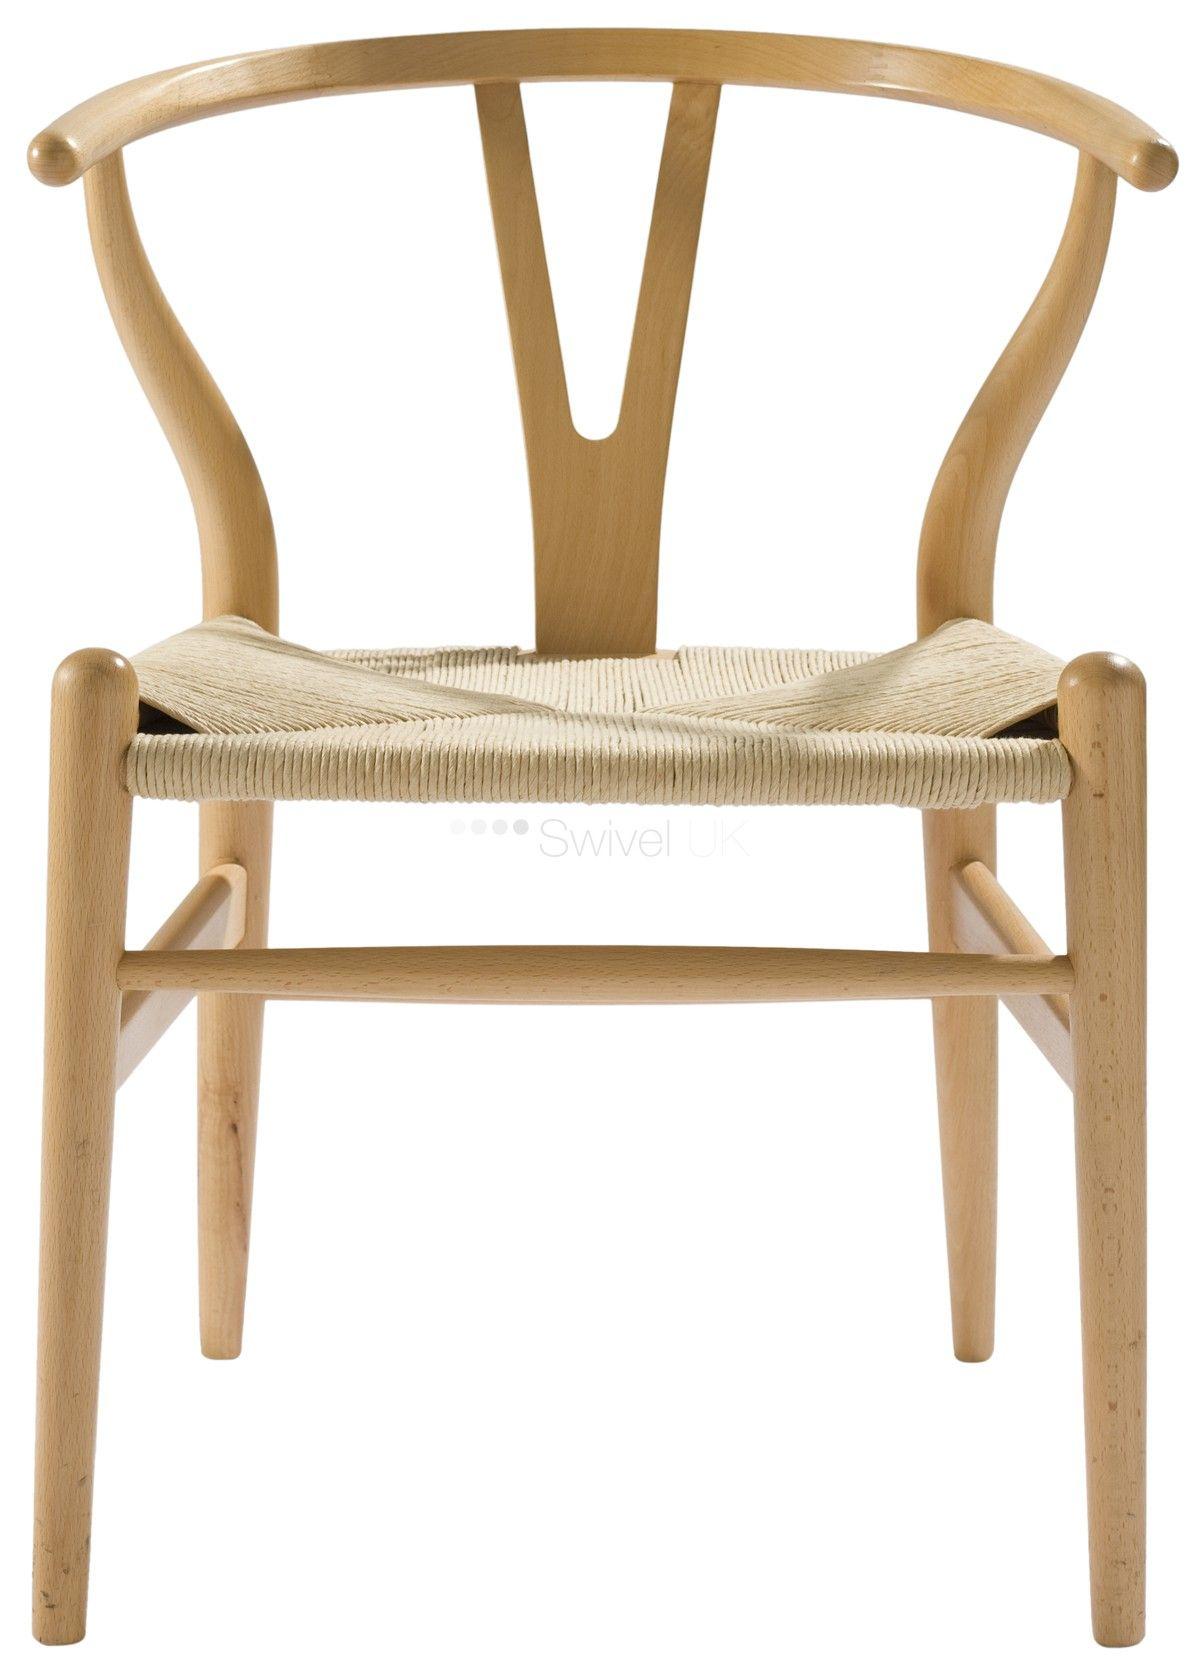 Wishbone Chair Wegner wishbone chair, Solid wood dining